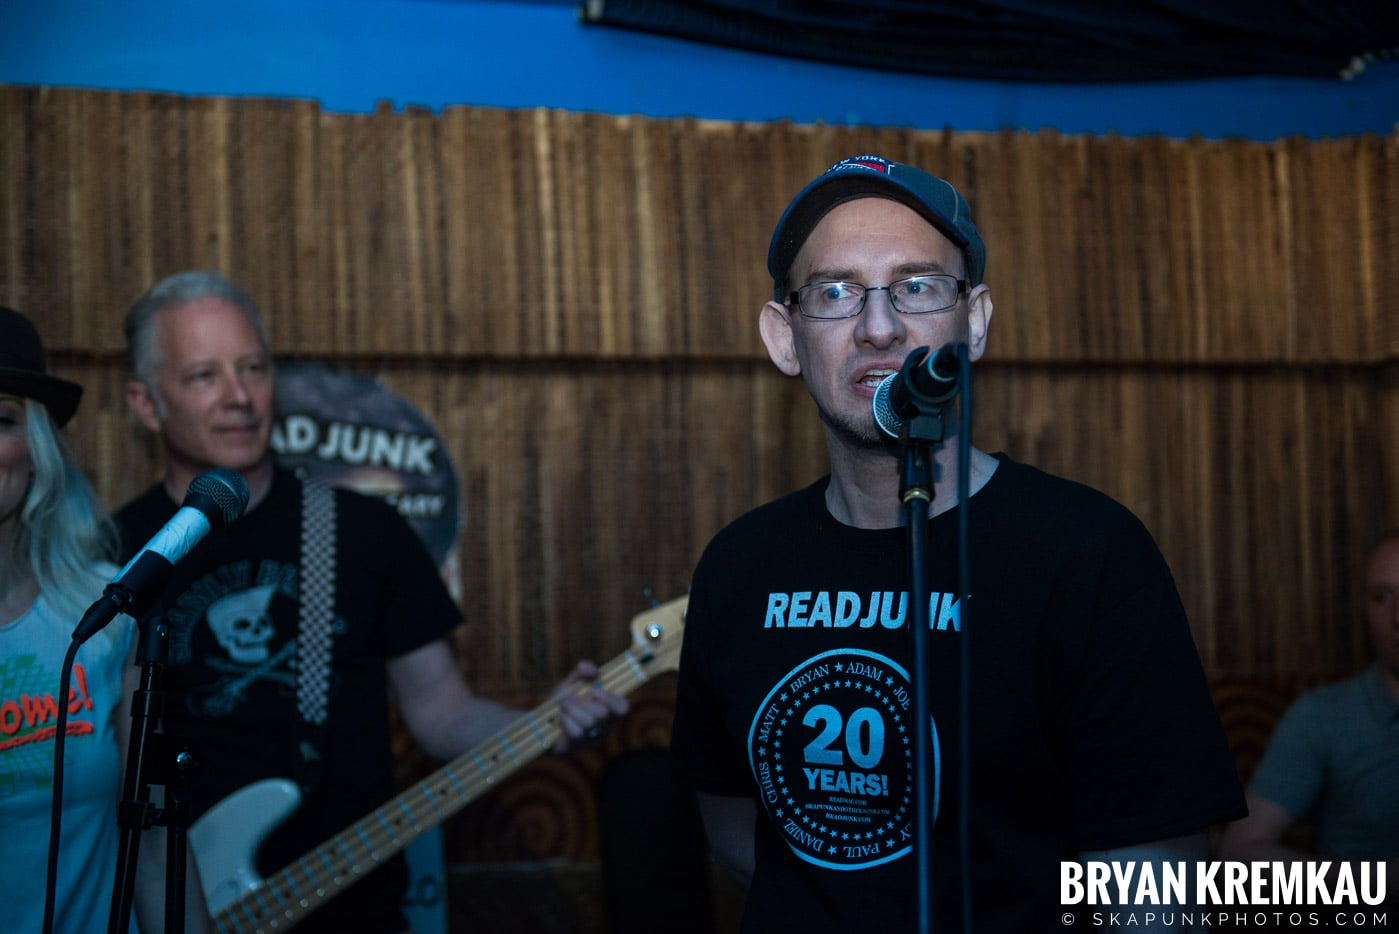 ReadJunk.com 20th Anniversary Party @ Otto's Shrunken Head, NYC - 4.29.17 (59)